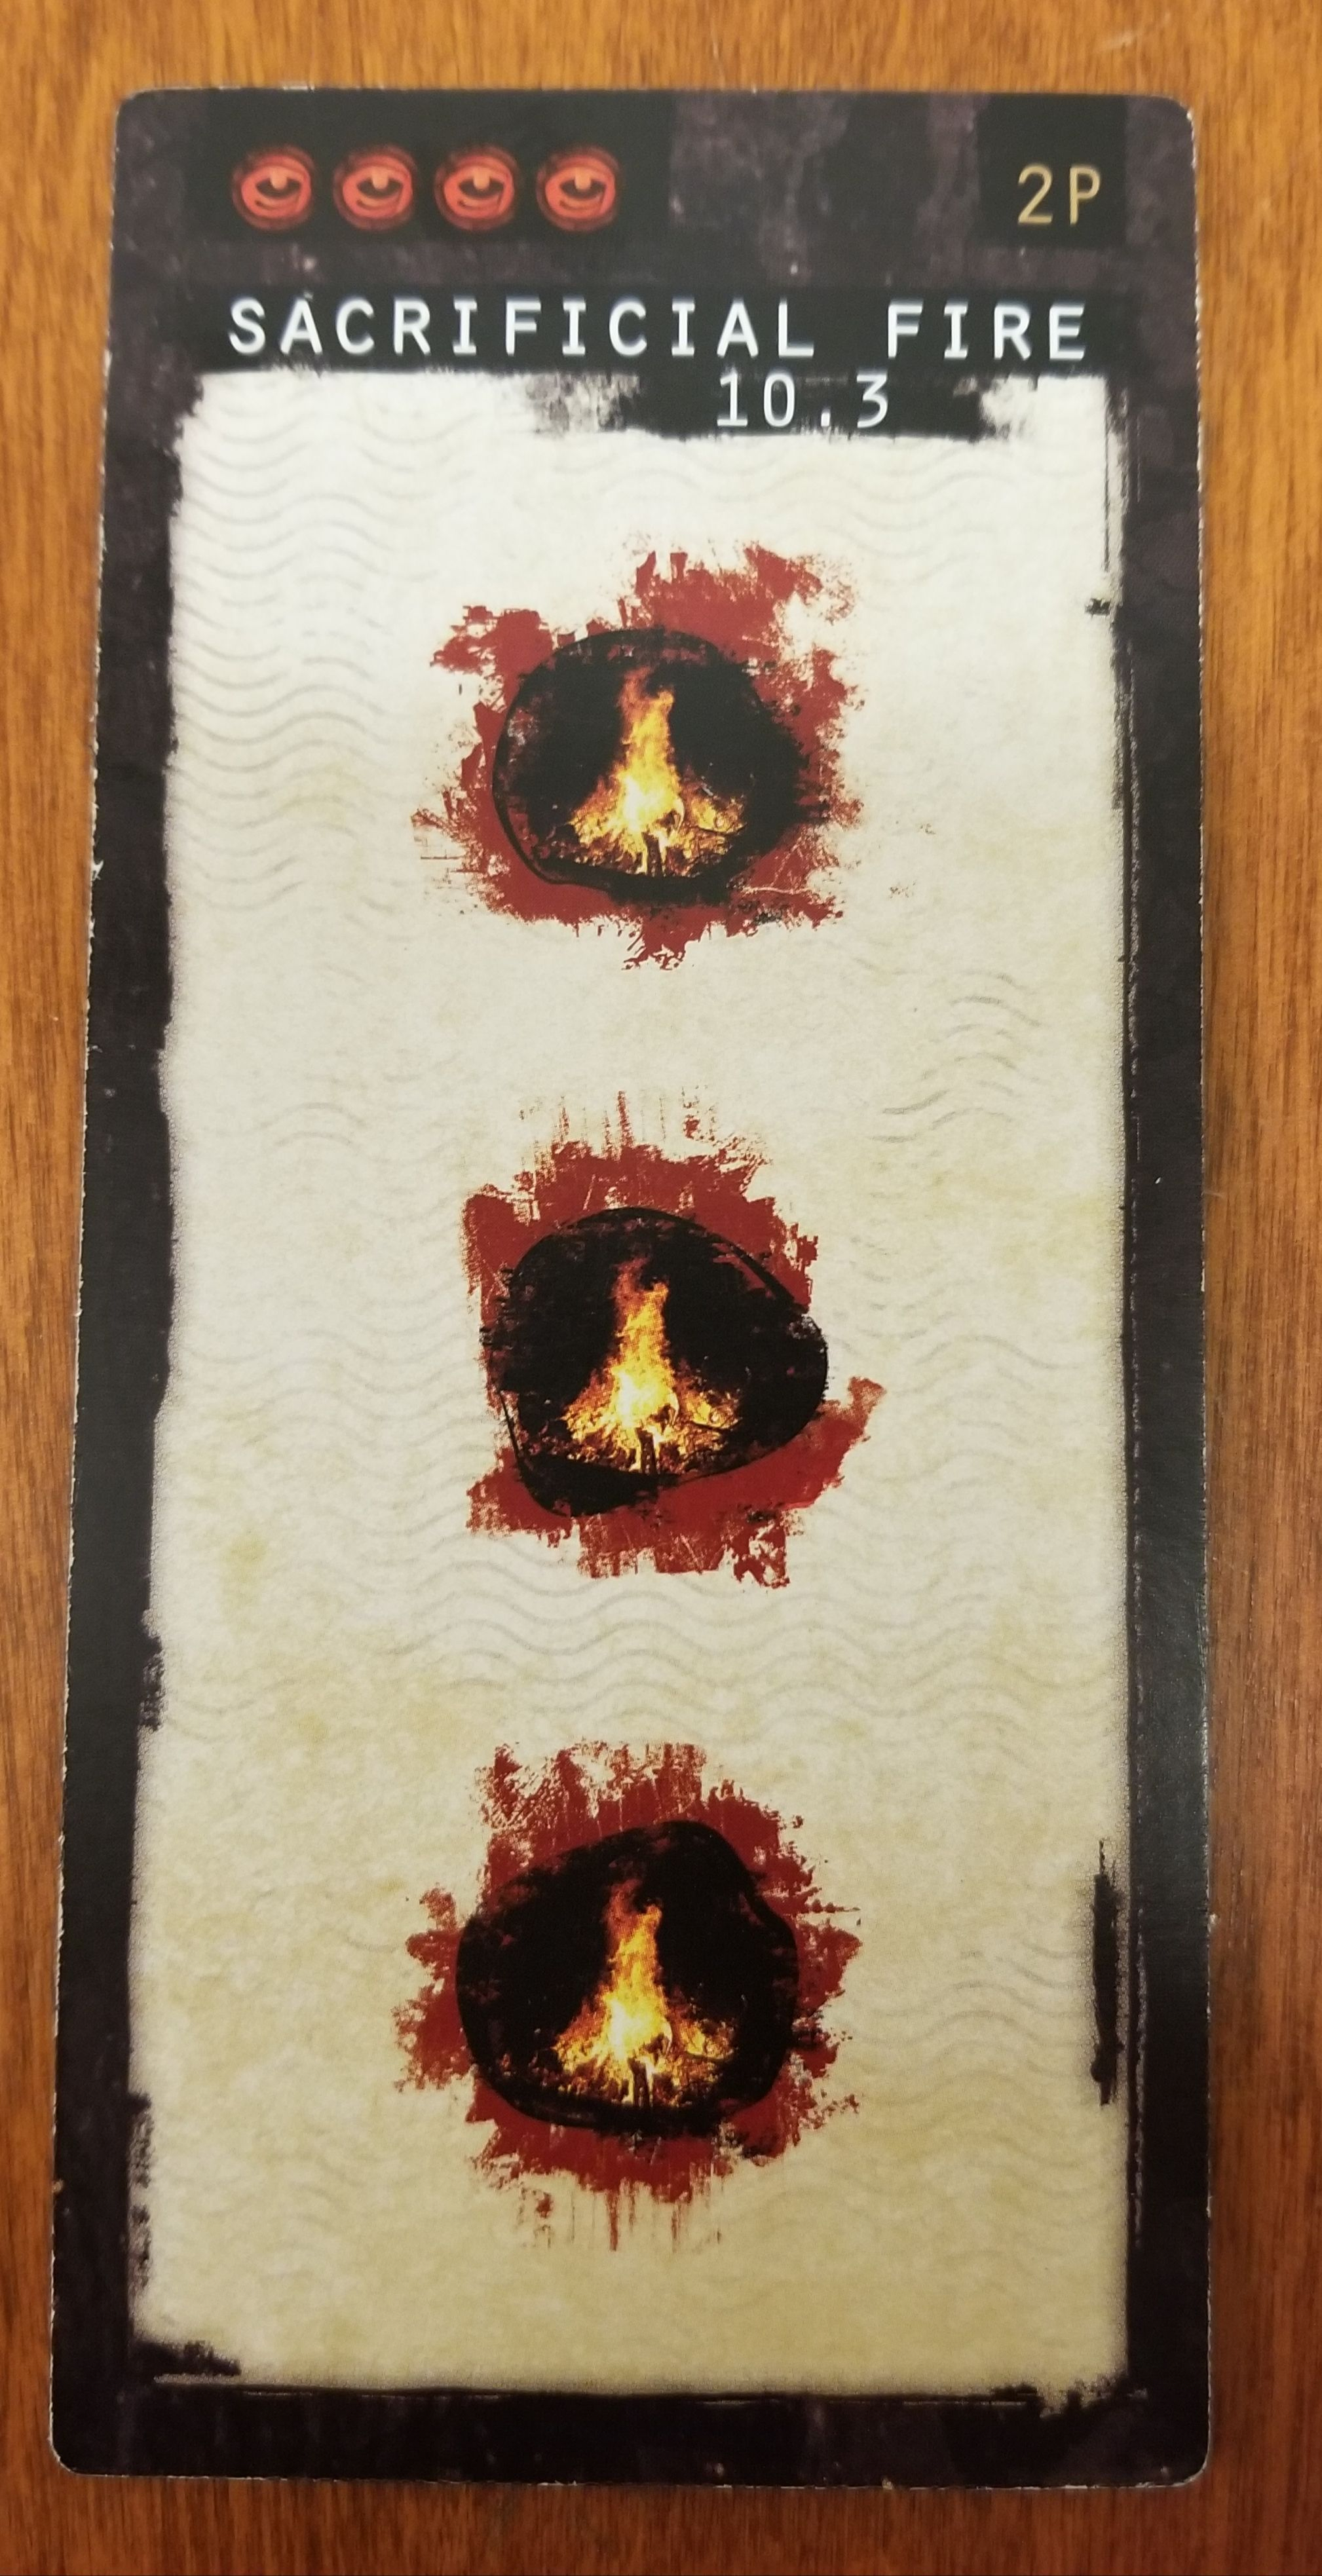 Sacrificial Fire Mini Expansion Promo For The Board Game NEW Gates of Delirium